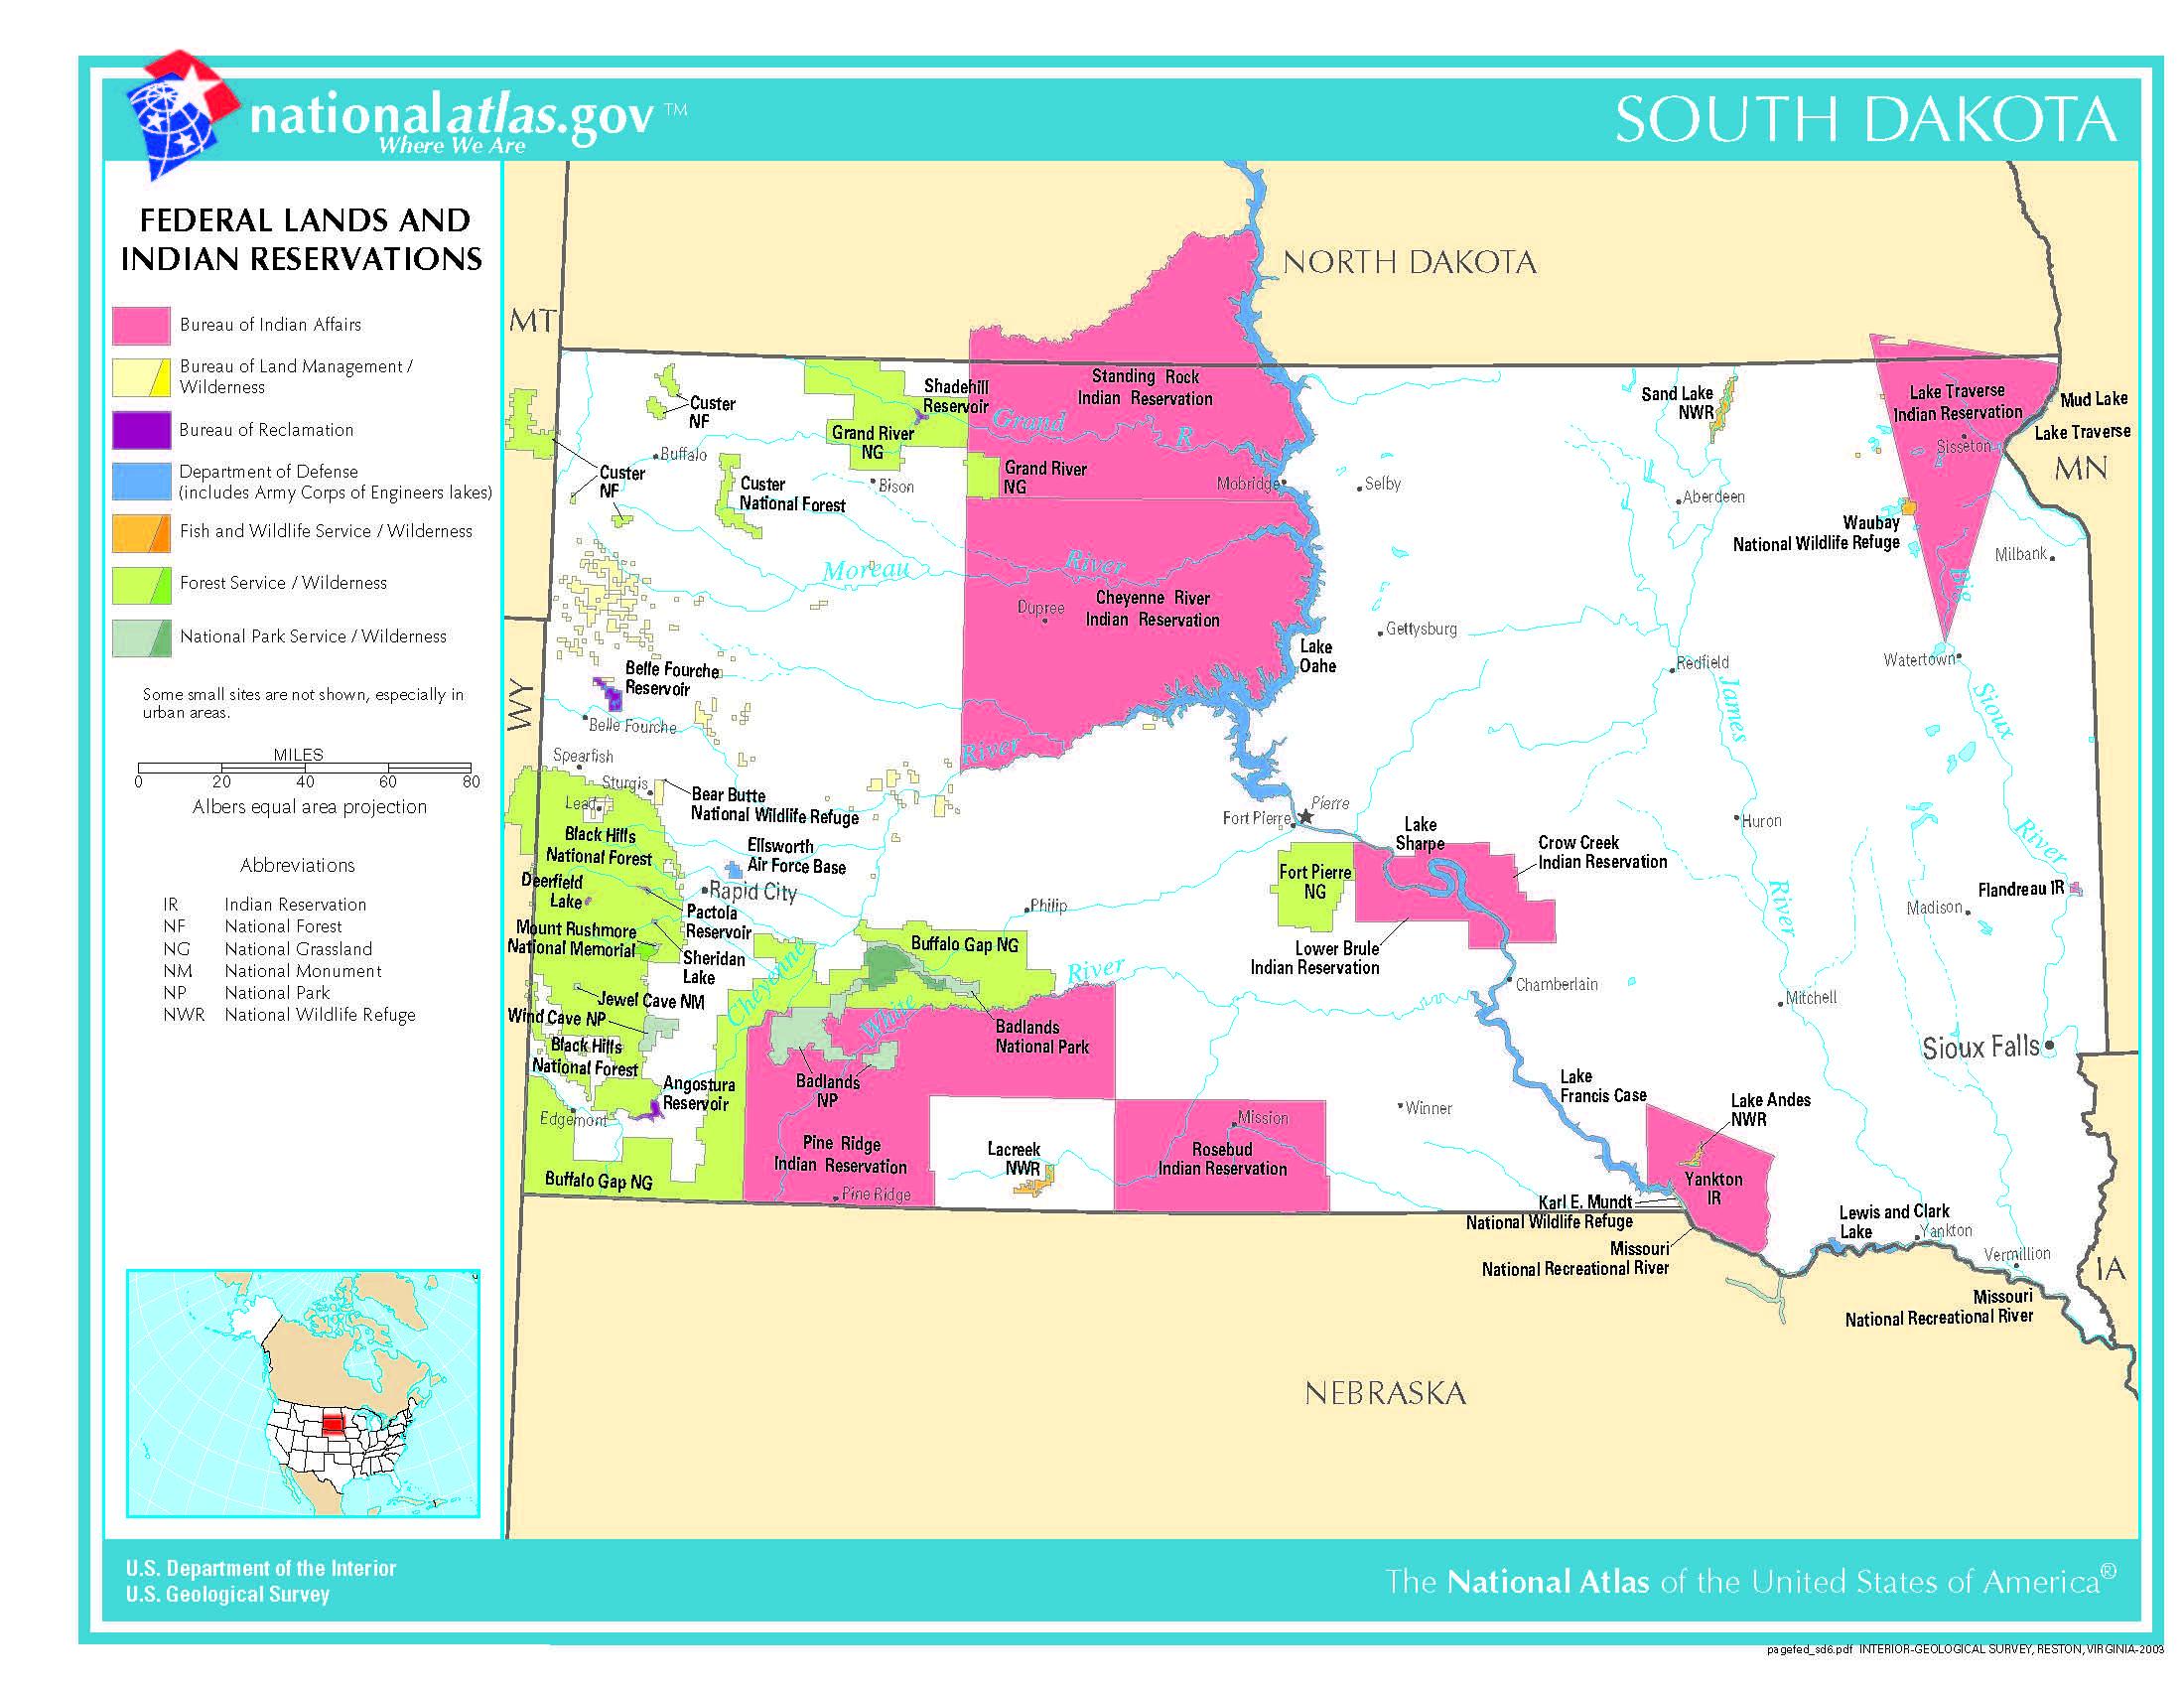 south dakota public land map Conservation Government Information Libguides At South Dakota south dakota public land map